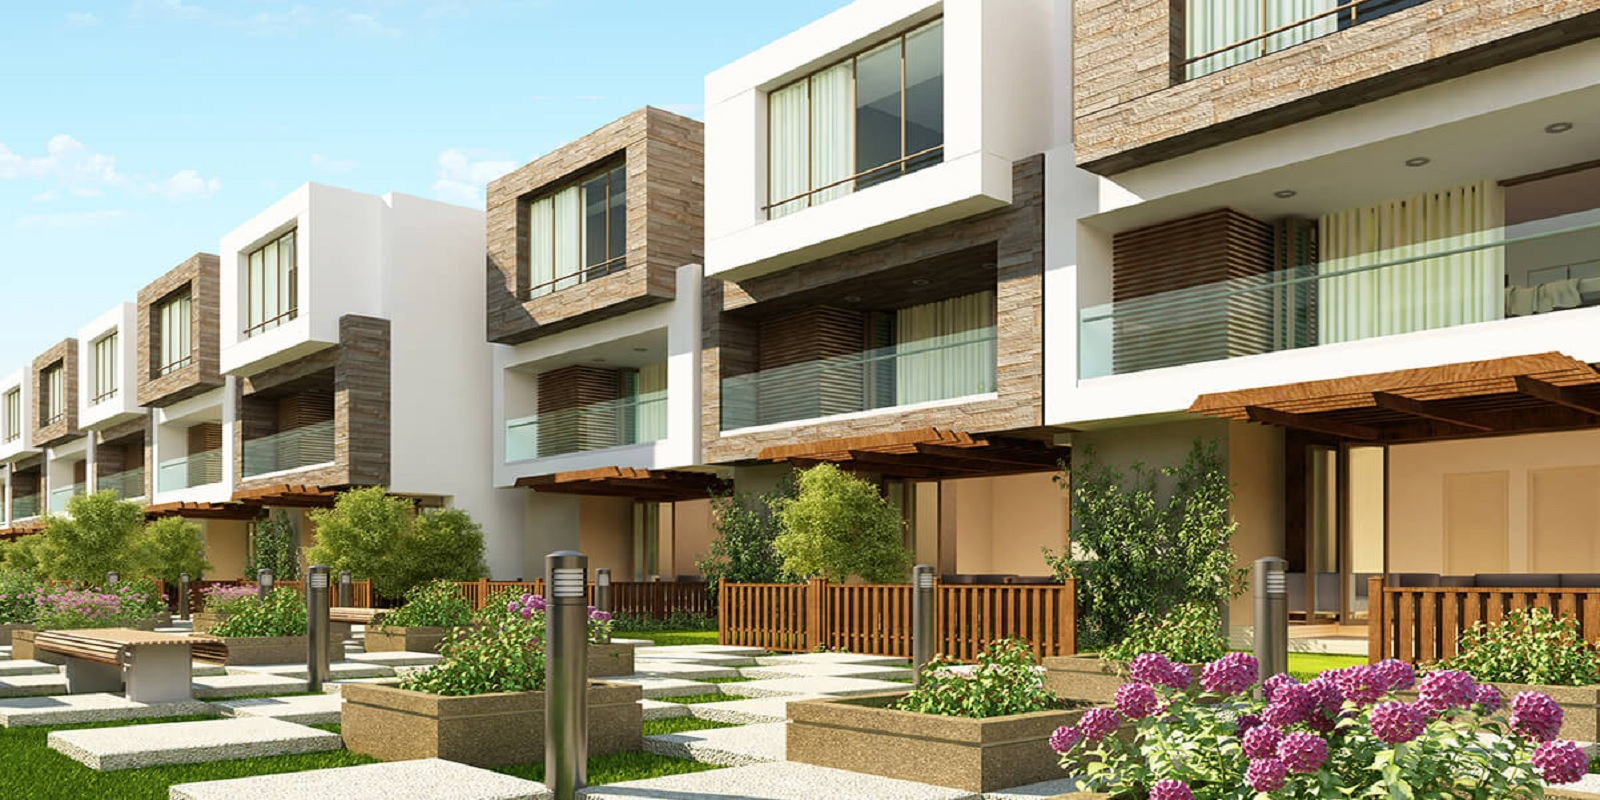 arvind expansia villa project large image12